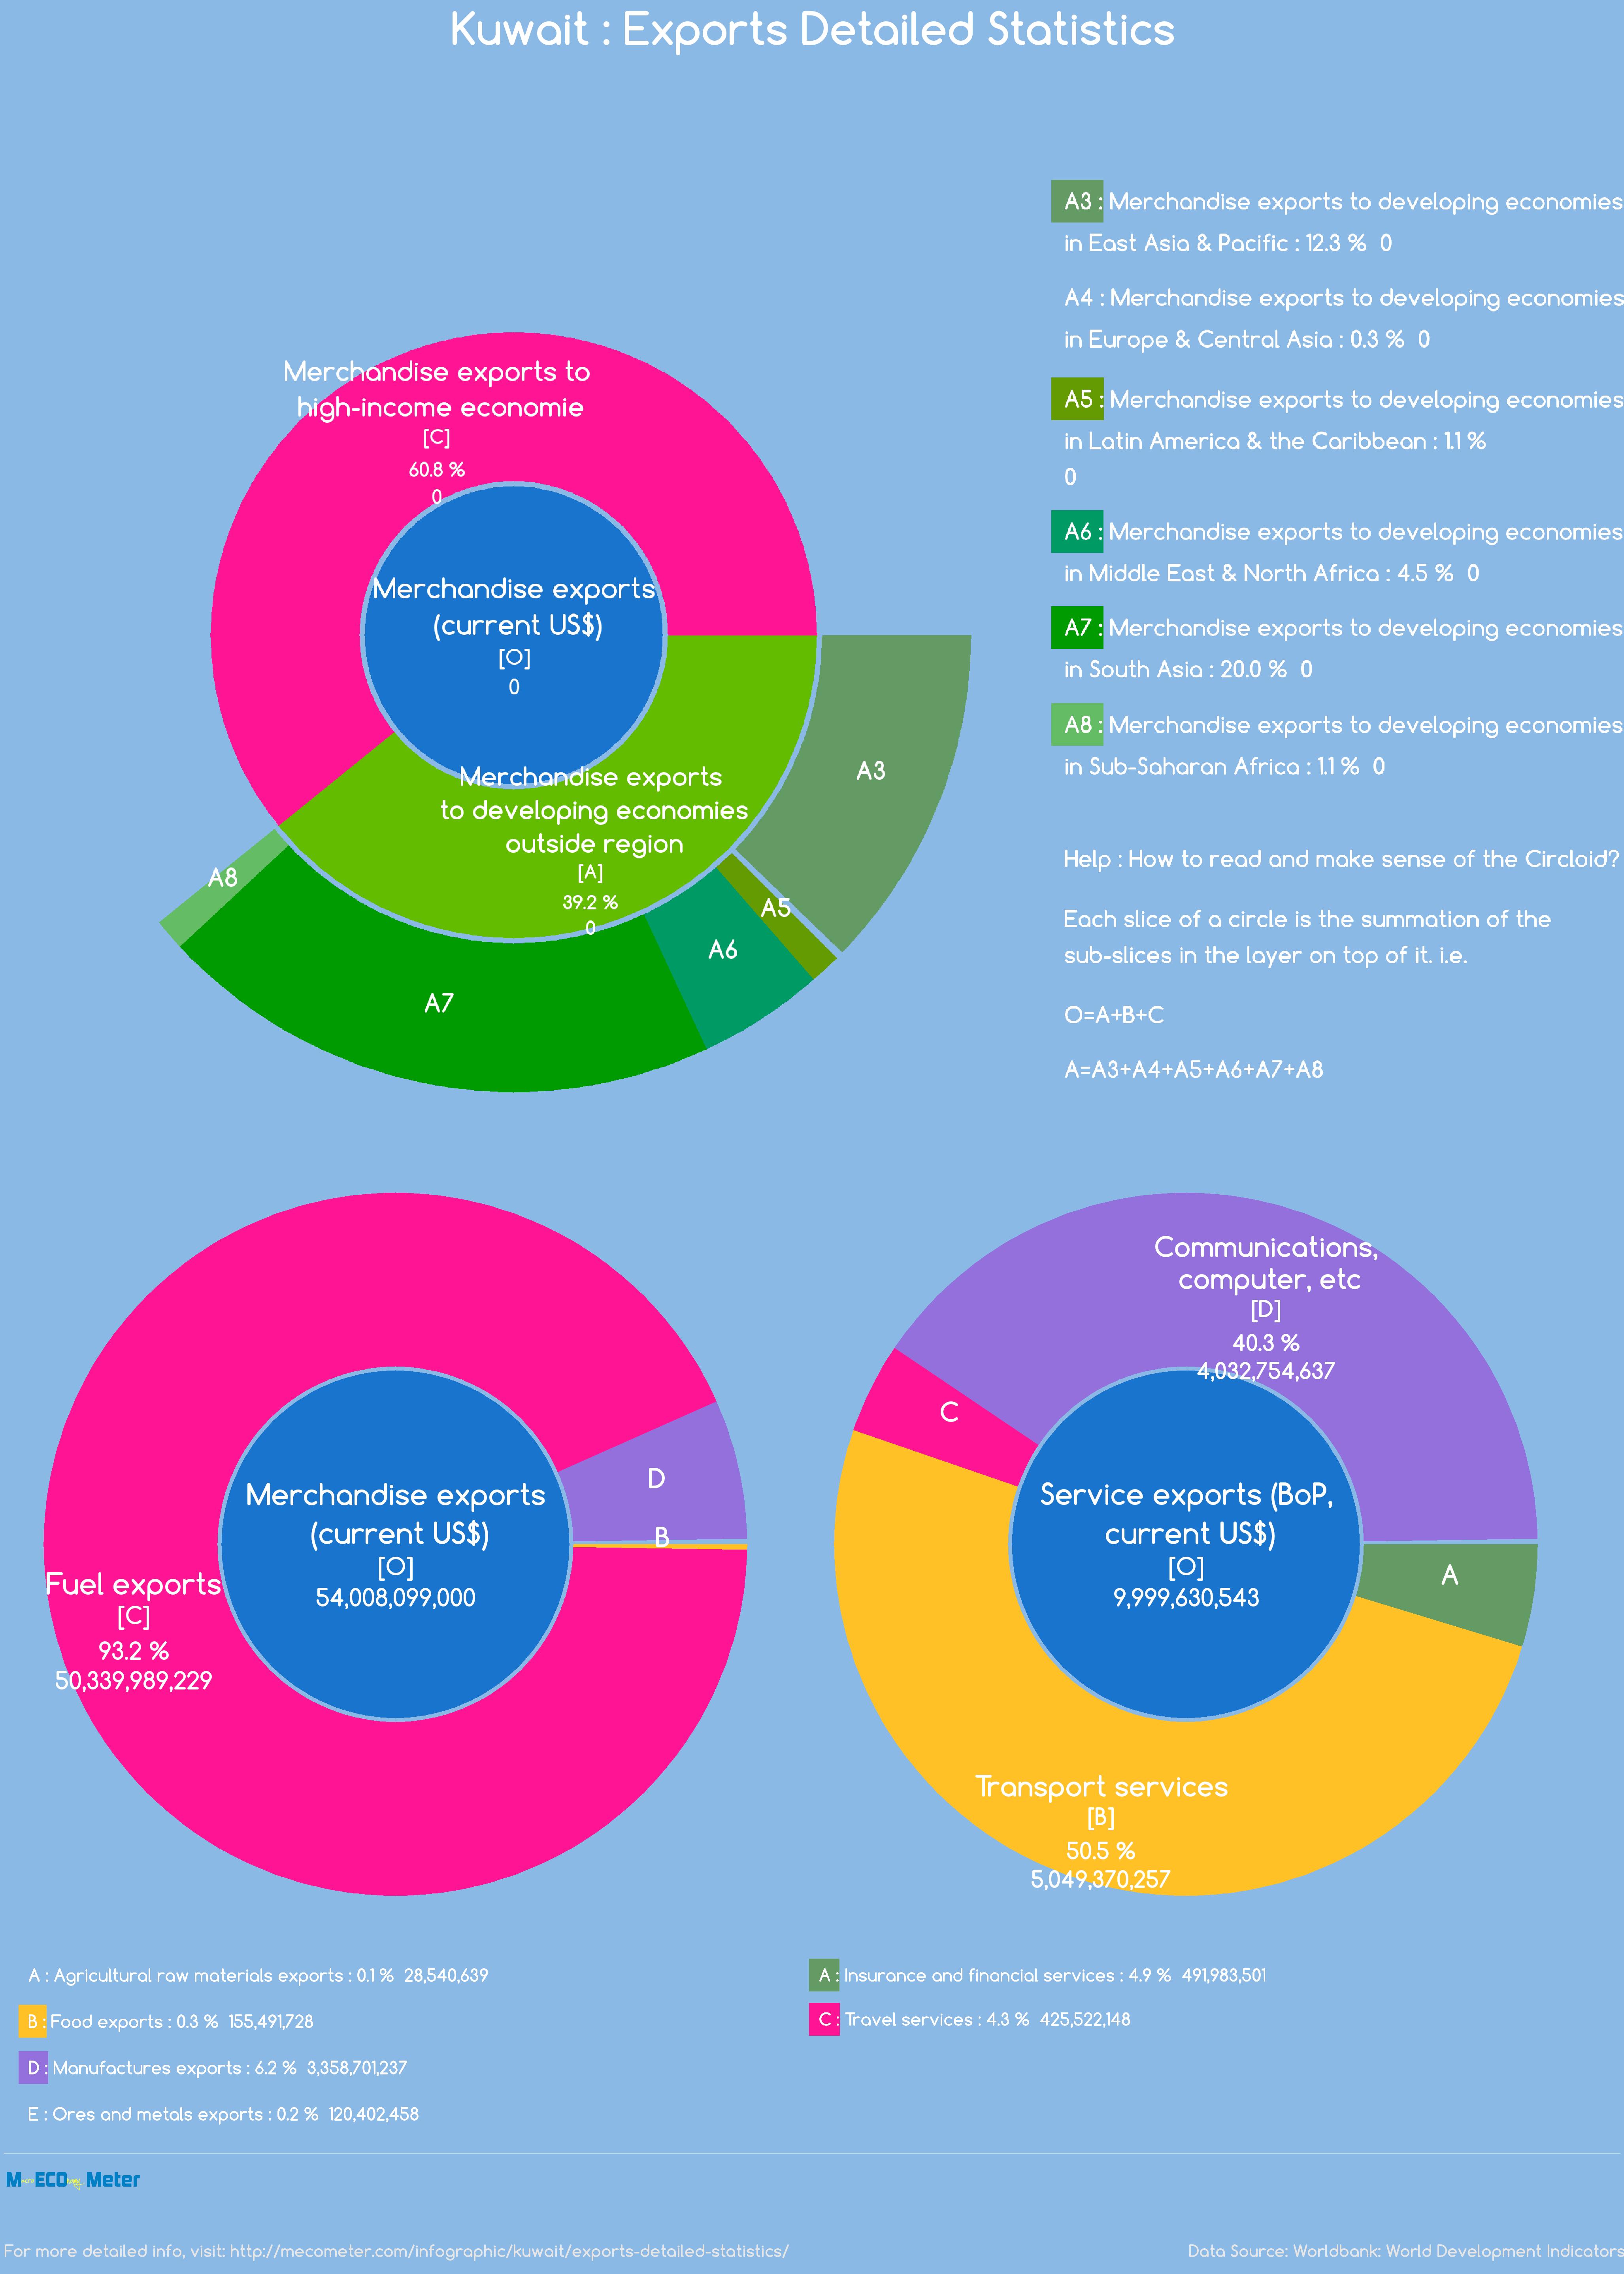 Kuwait : Exports Detailed Statistics